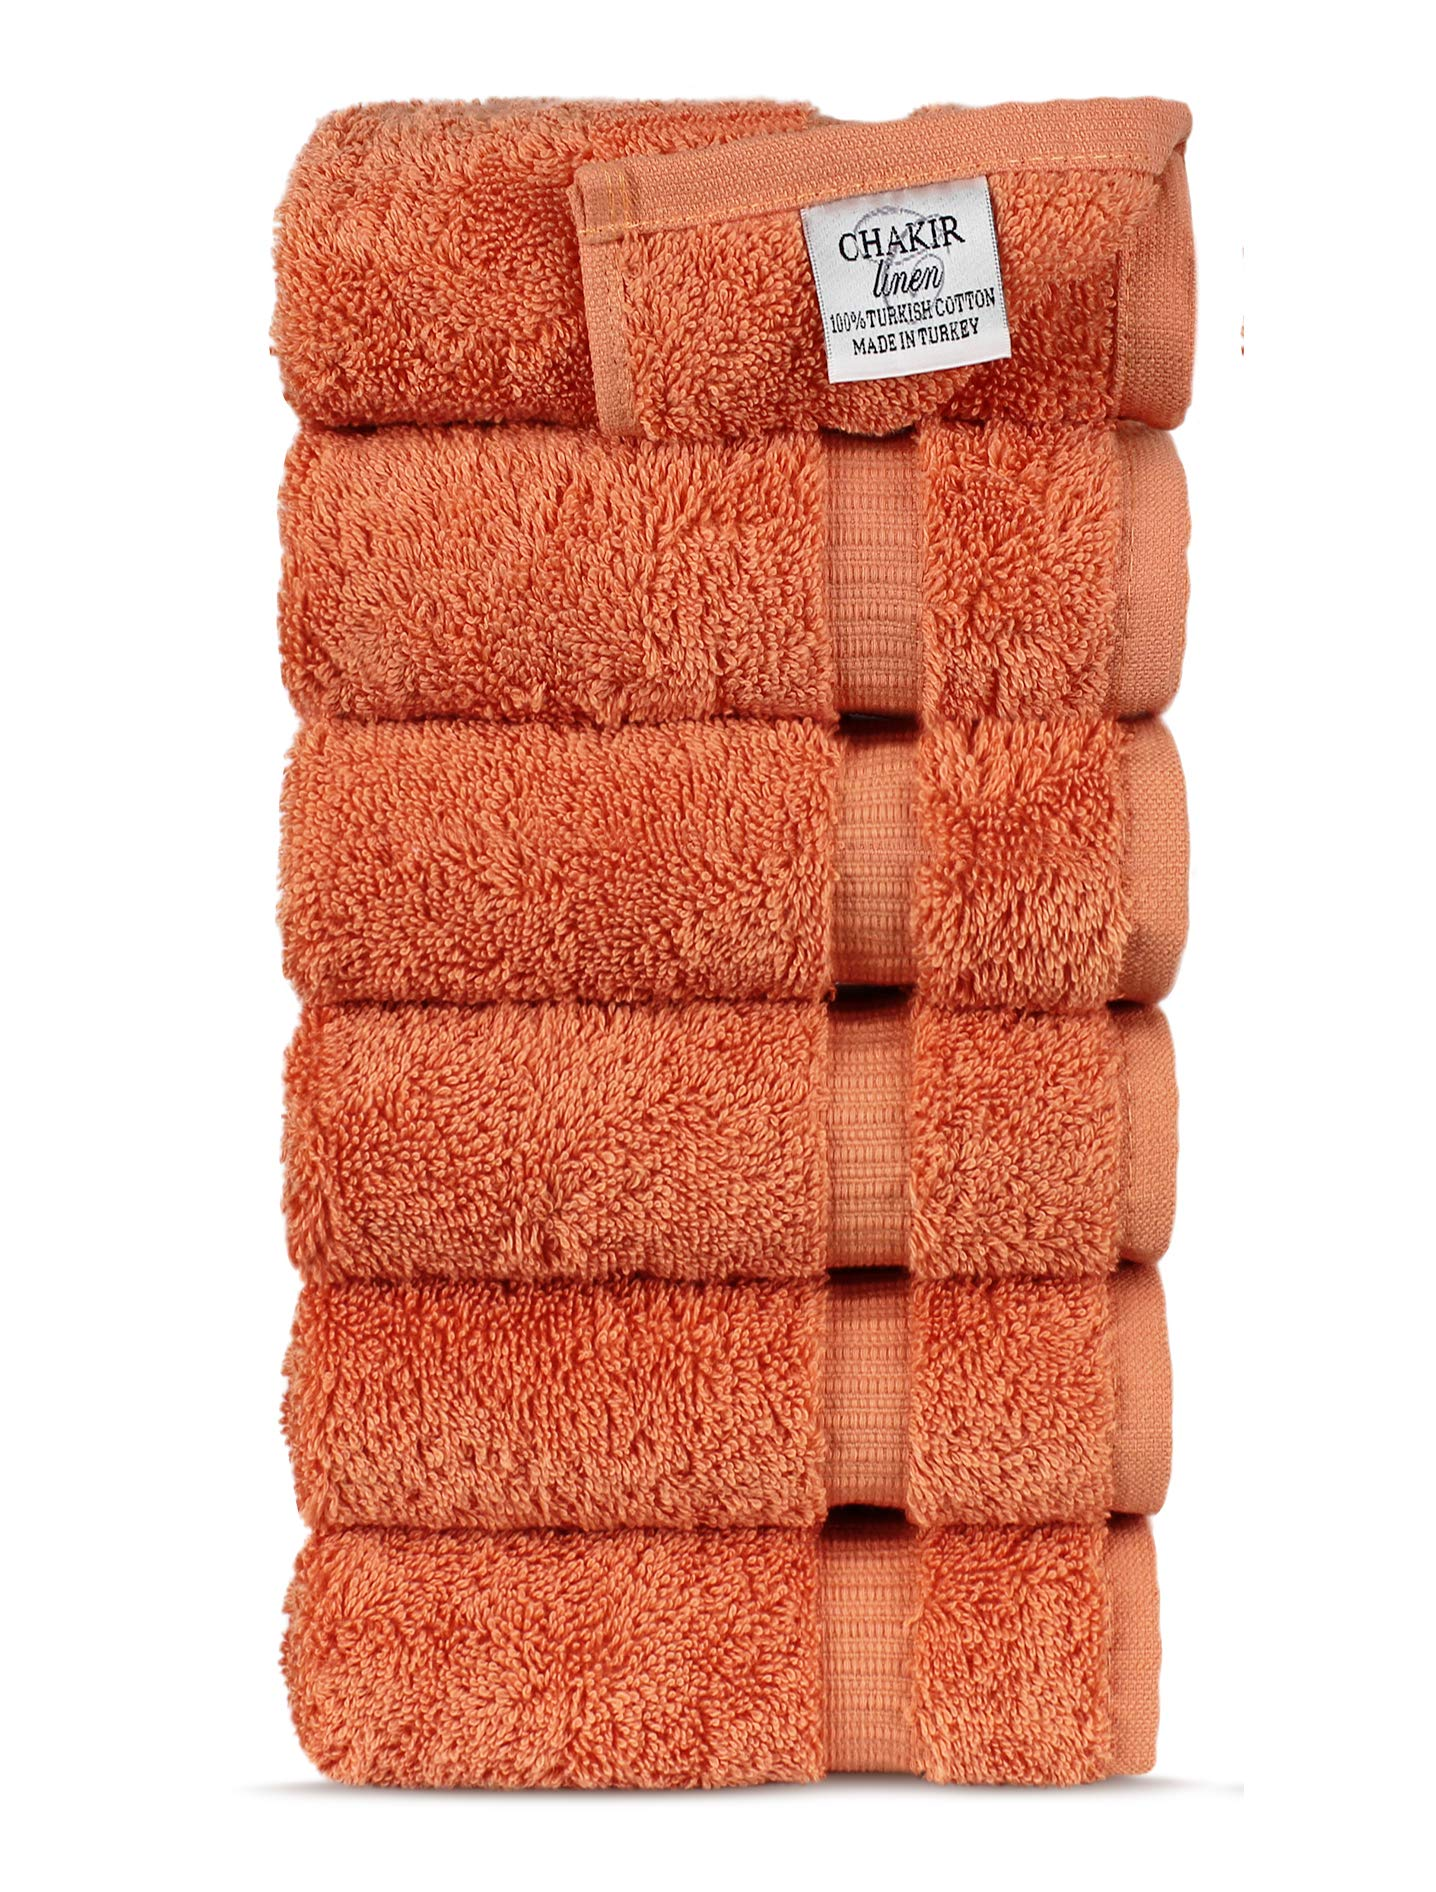 Chakir Turkish Linens Luxury Hotel & Spa Hand Towel Turkish Cotton, 16'' x 30'', Set of 6 (Coral)